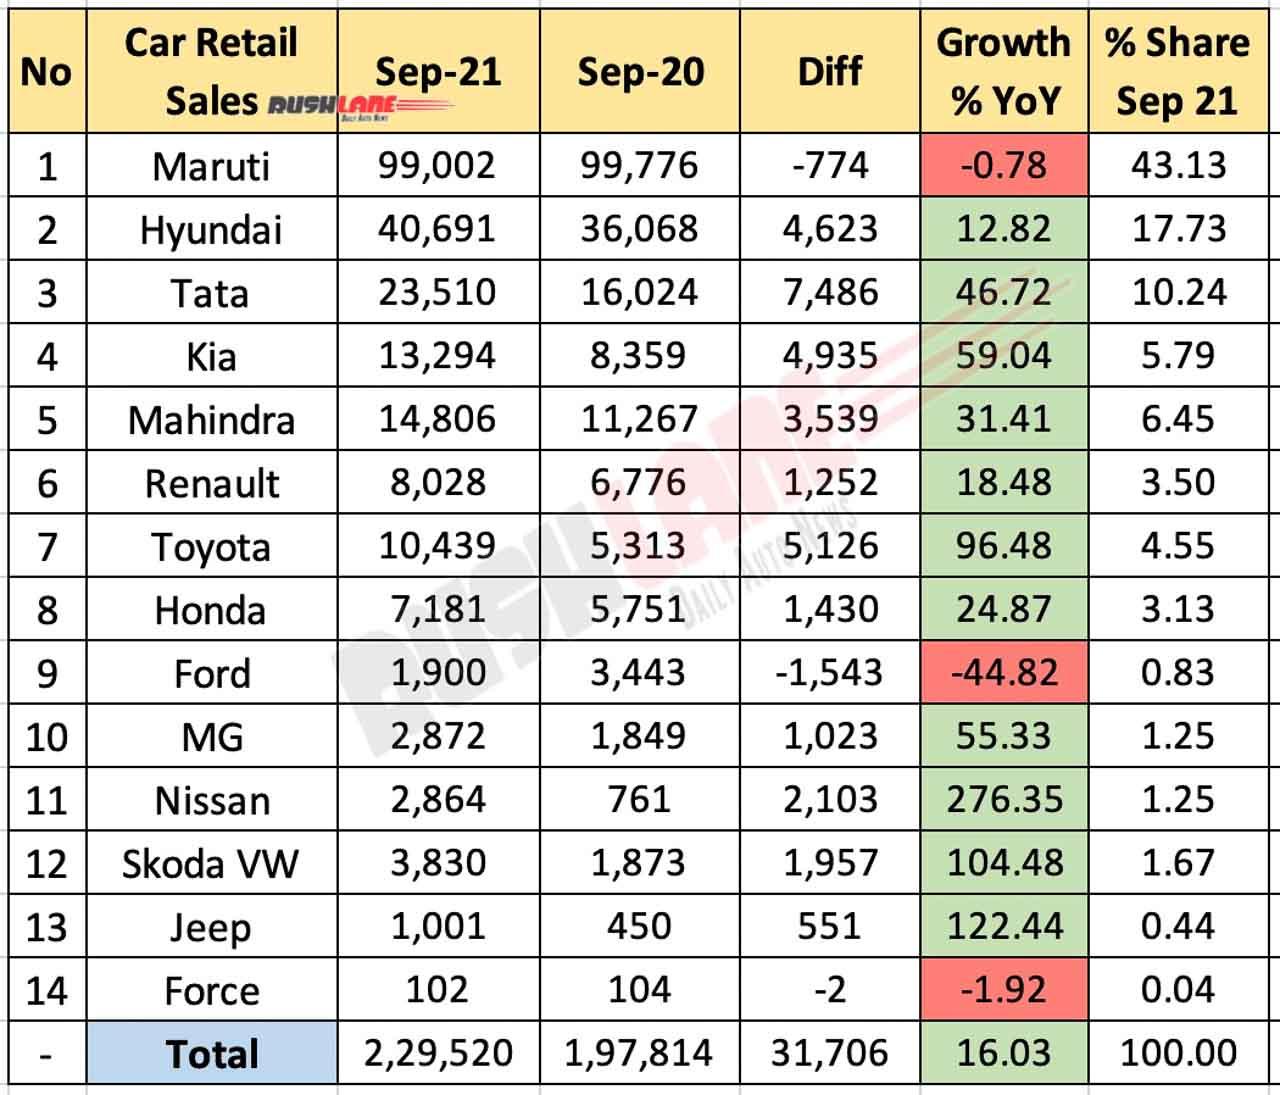 Car Retail Sales September 2021 vs. September 2020 (Year-on-Year)